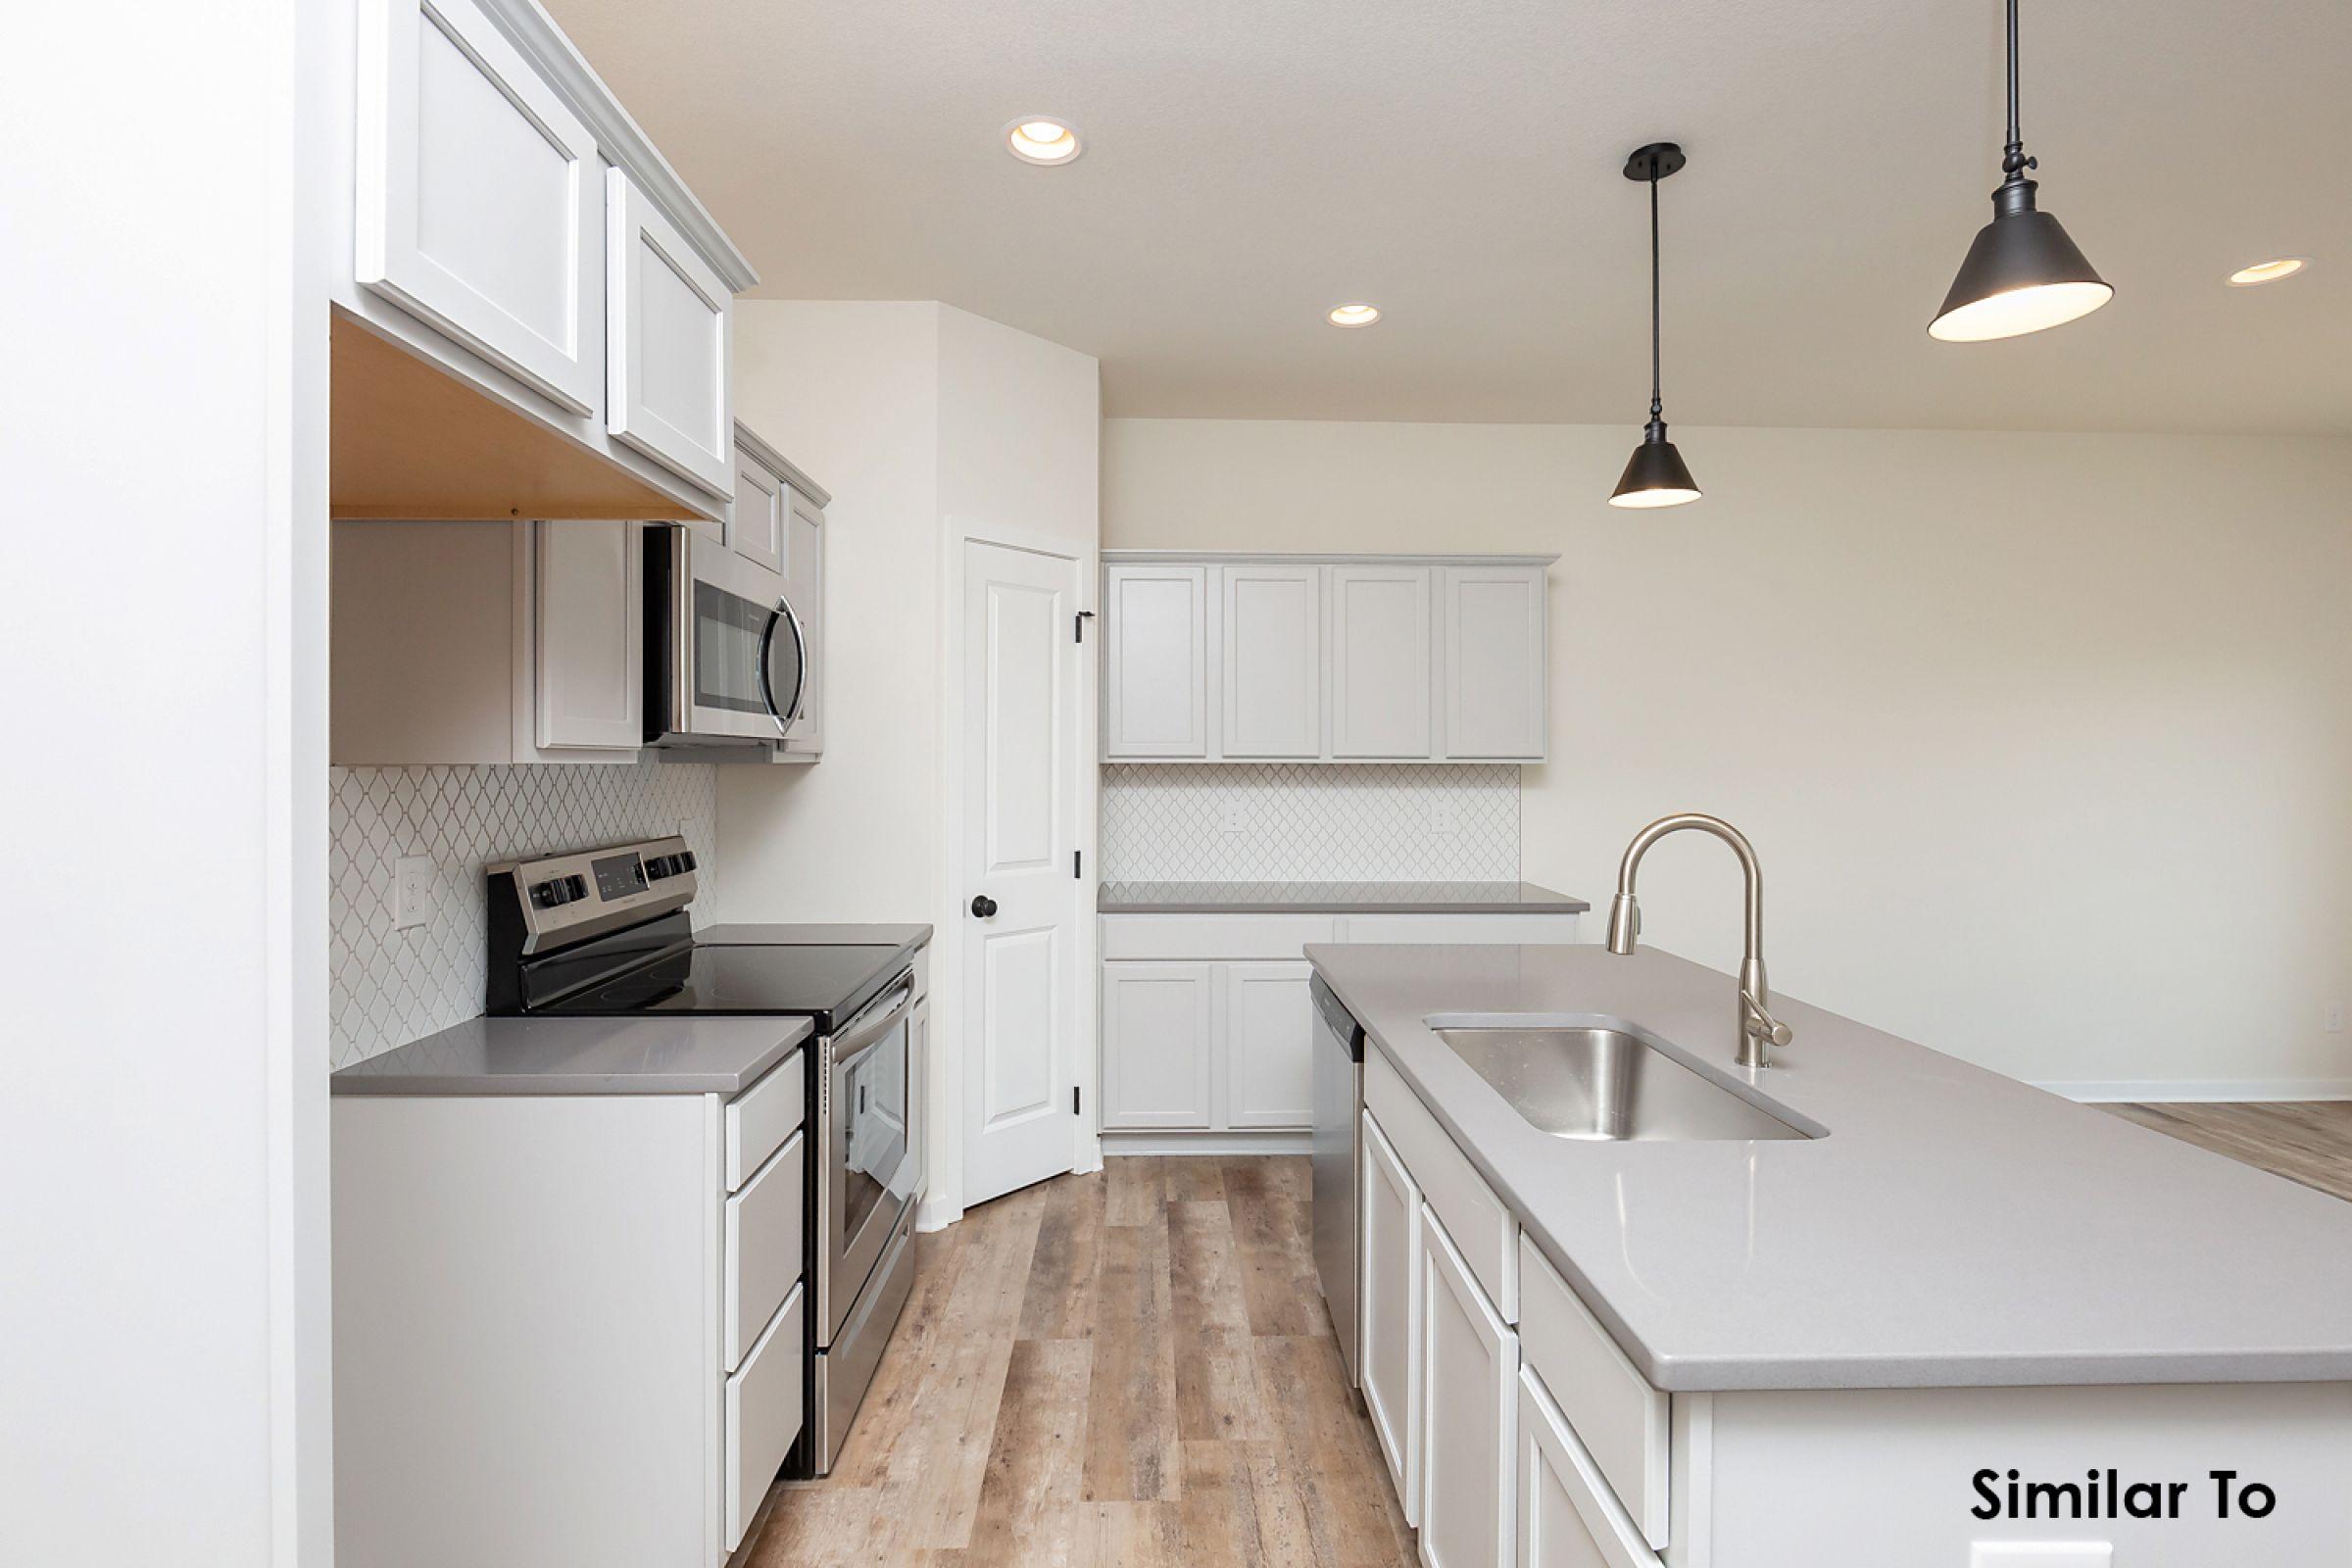 residential-warren-county-iowa-0-acres-listing-number-15138-7-2020-08-28-172754.jpg